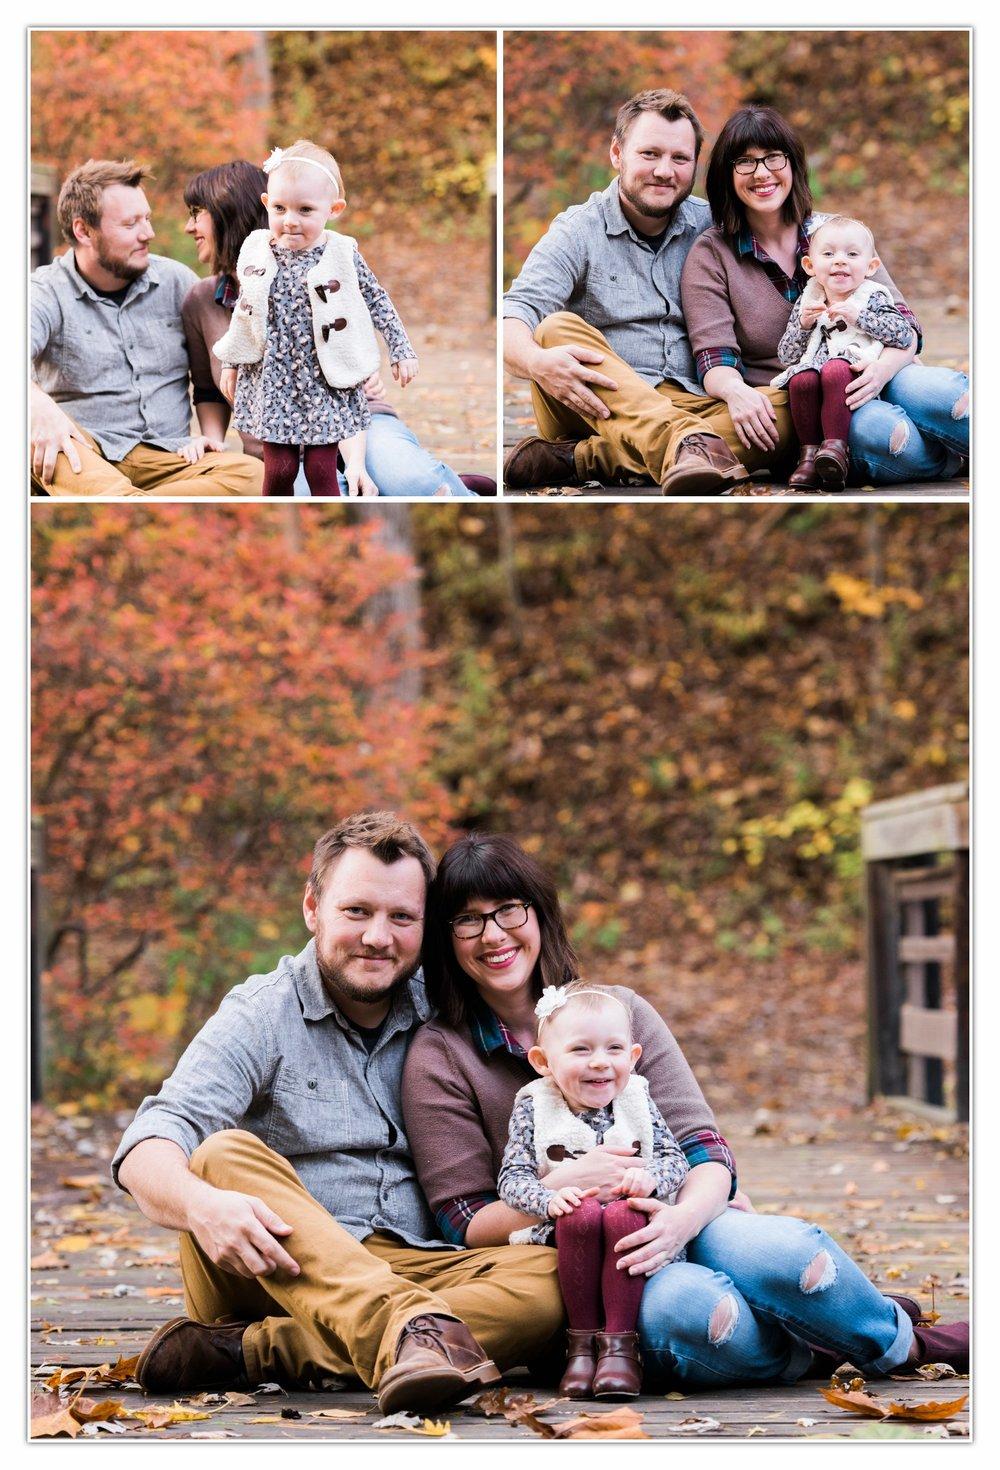 Berryhill Family 6.jpg